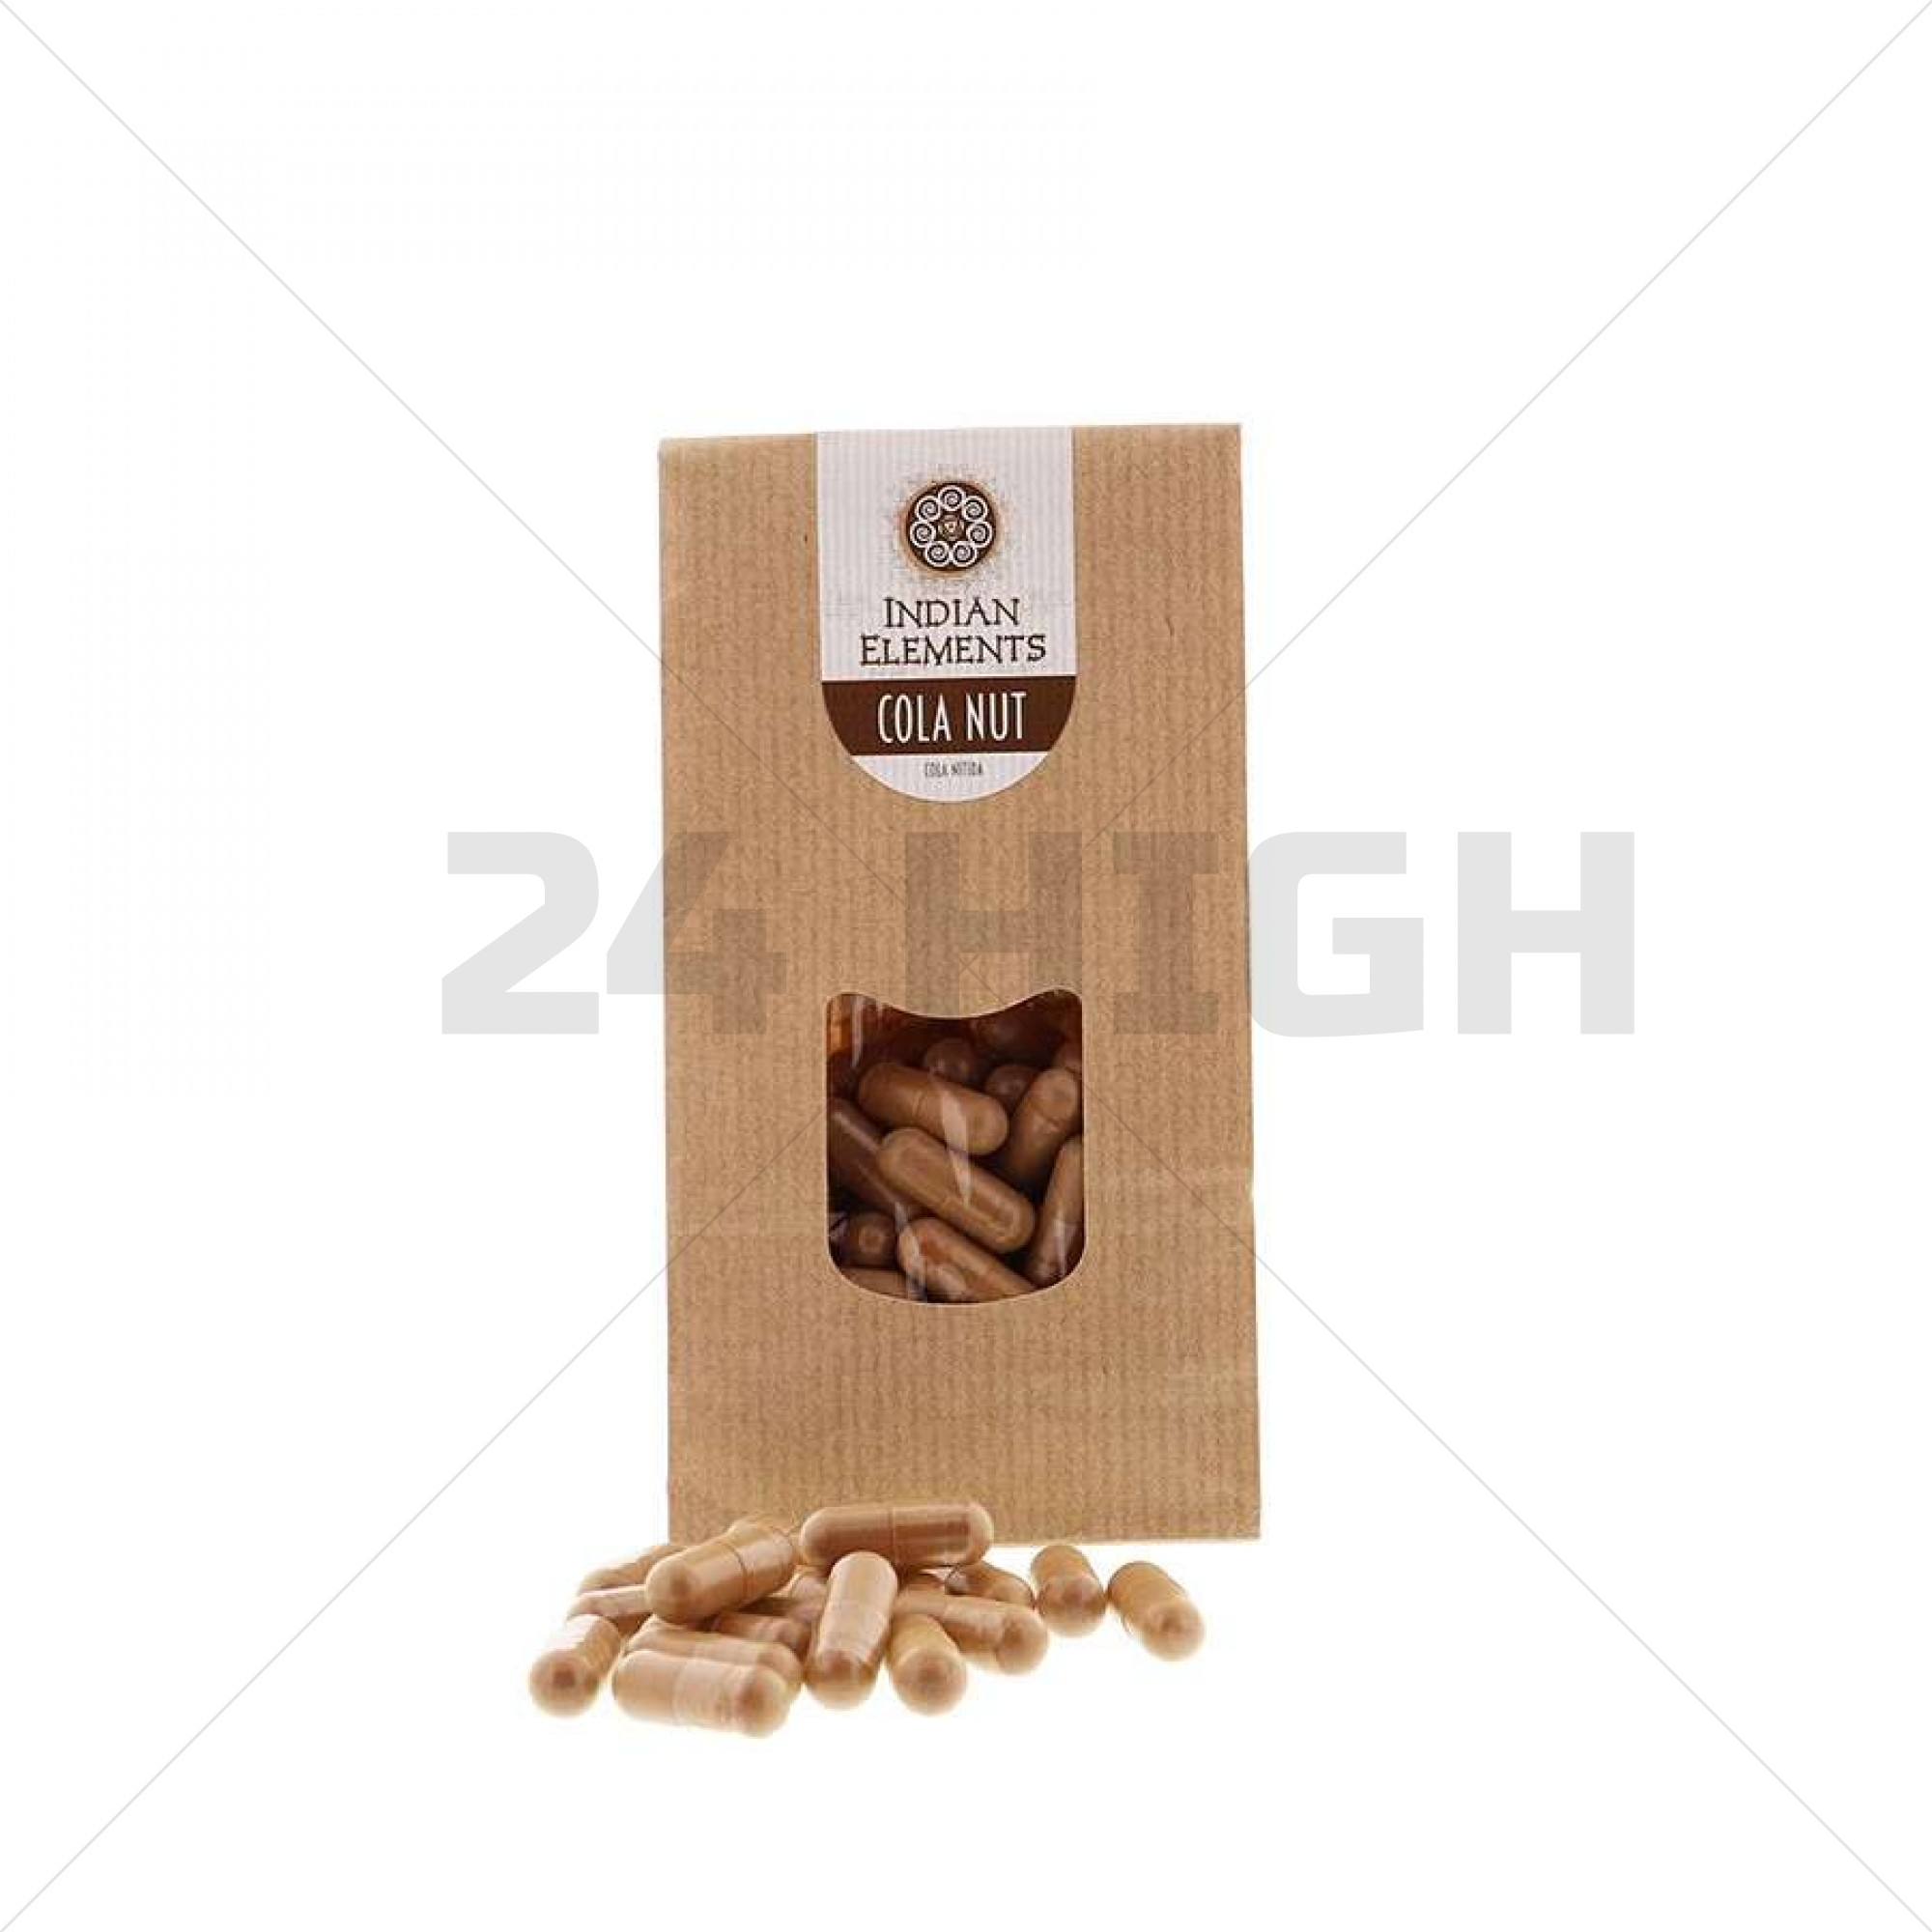 Cola Nut Indian Elements - Capsules